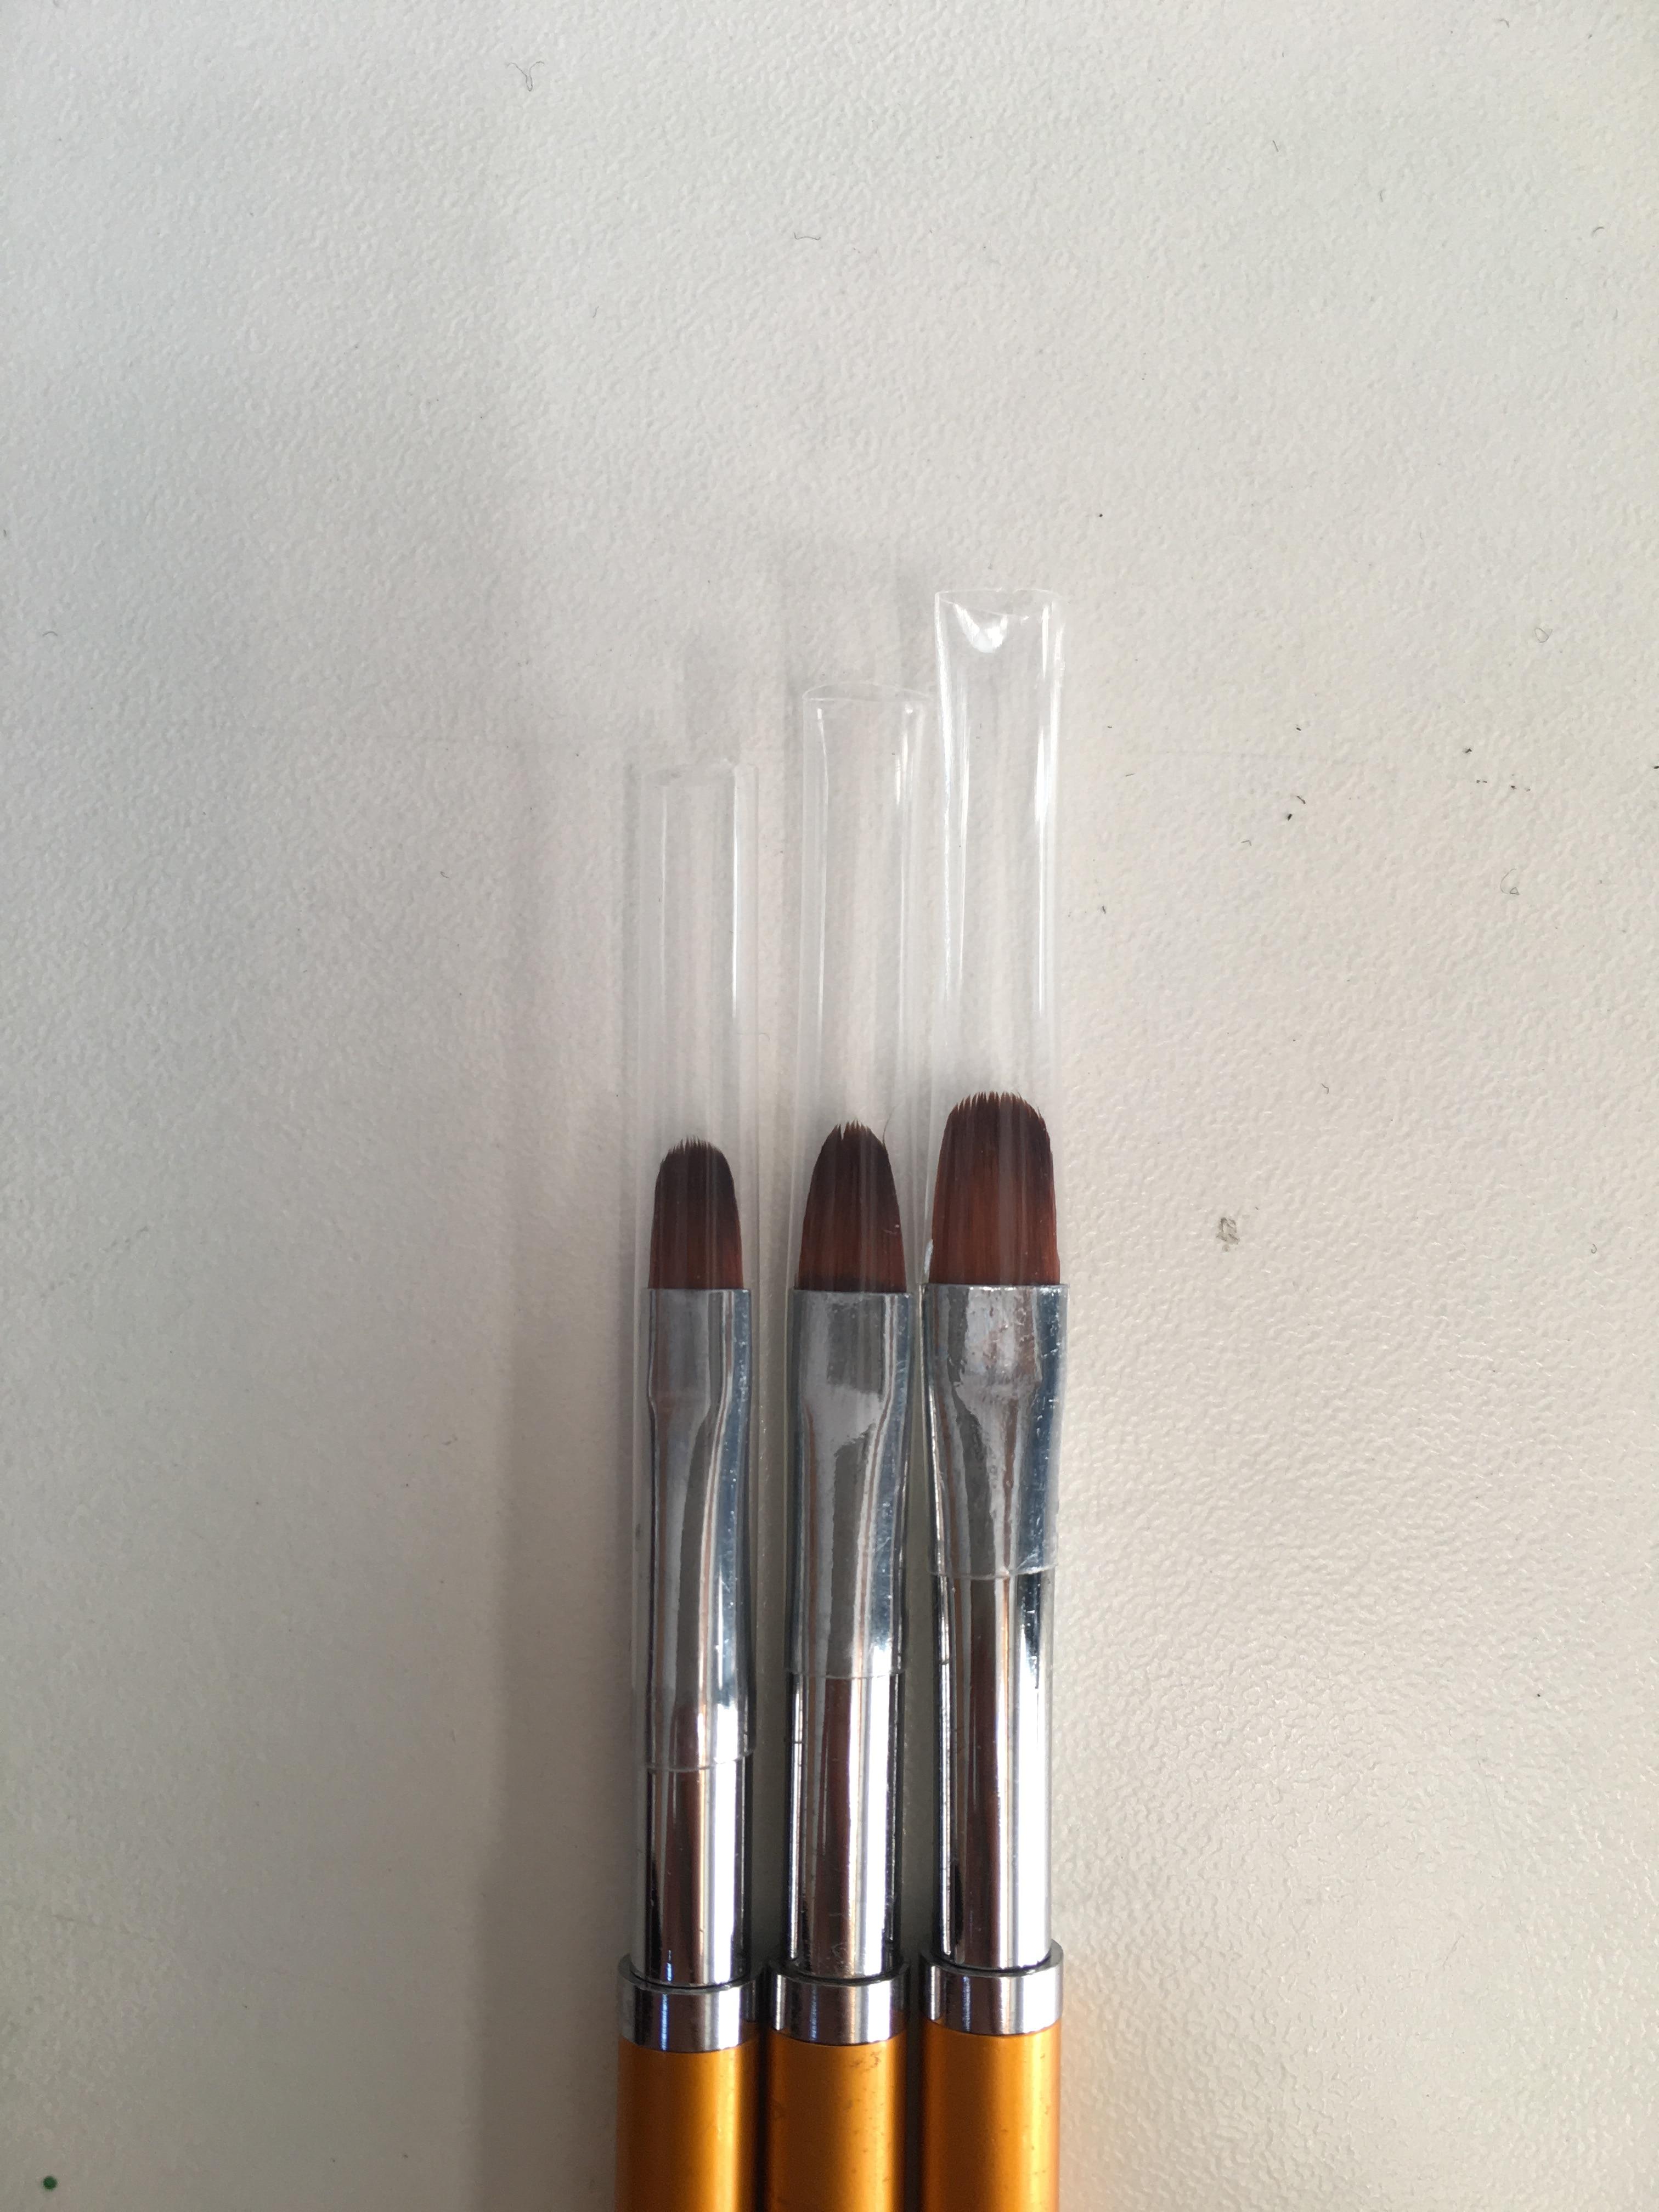 3 Size Nail Art Gold Round Top Painting Brush Set Gel Polish Tips Extending Coating 3D Petal Flower DIY Drawing Shaping Pens Kit reviews №3 161373